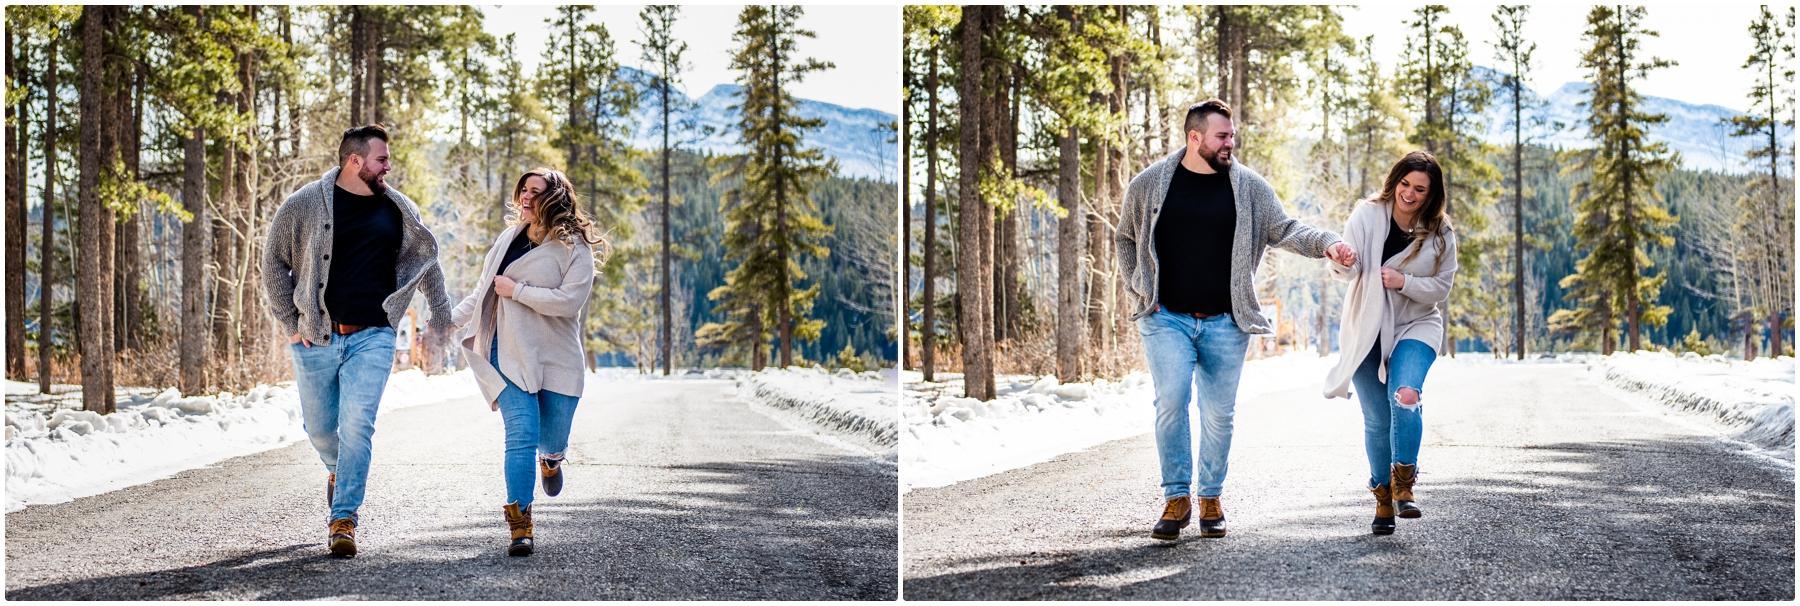 Banff Engagement Photographer - Lake Minniwanka